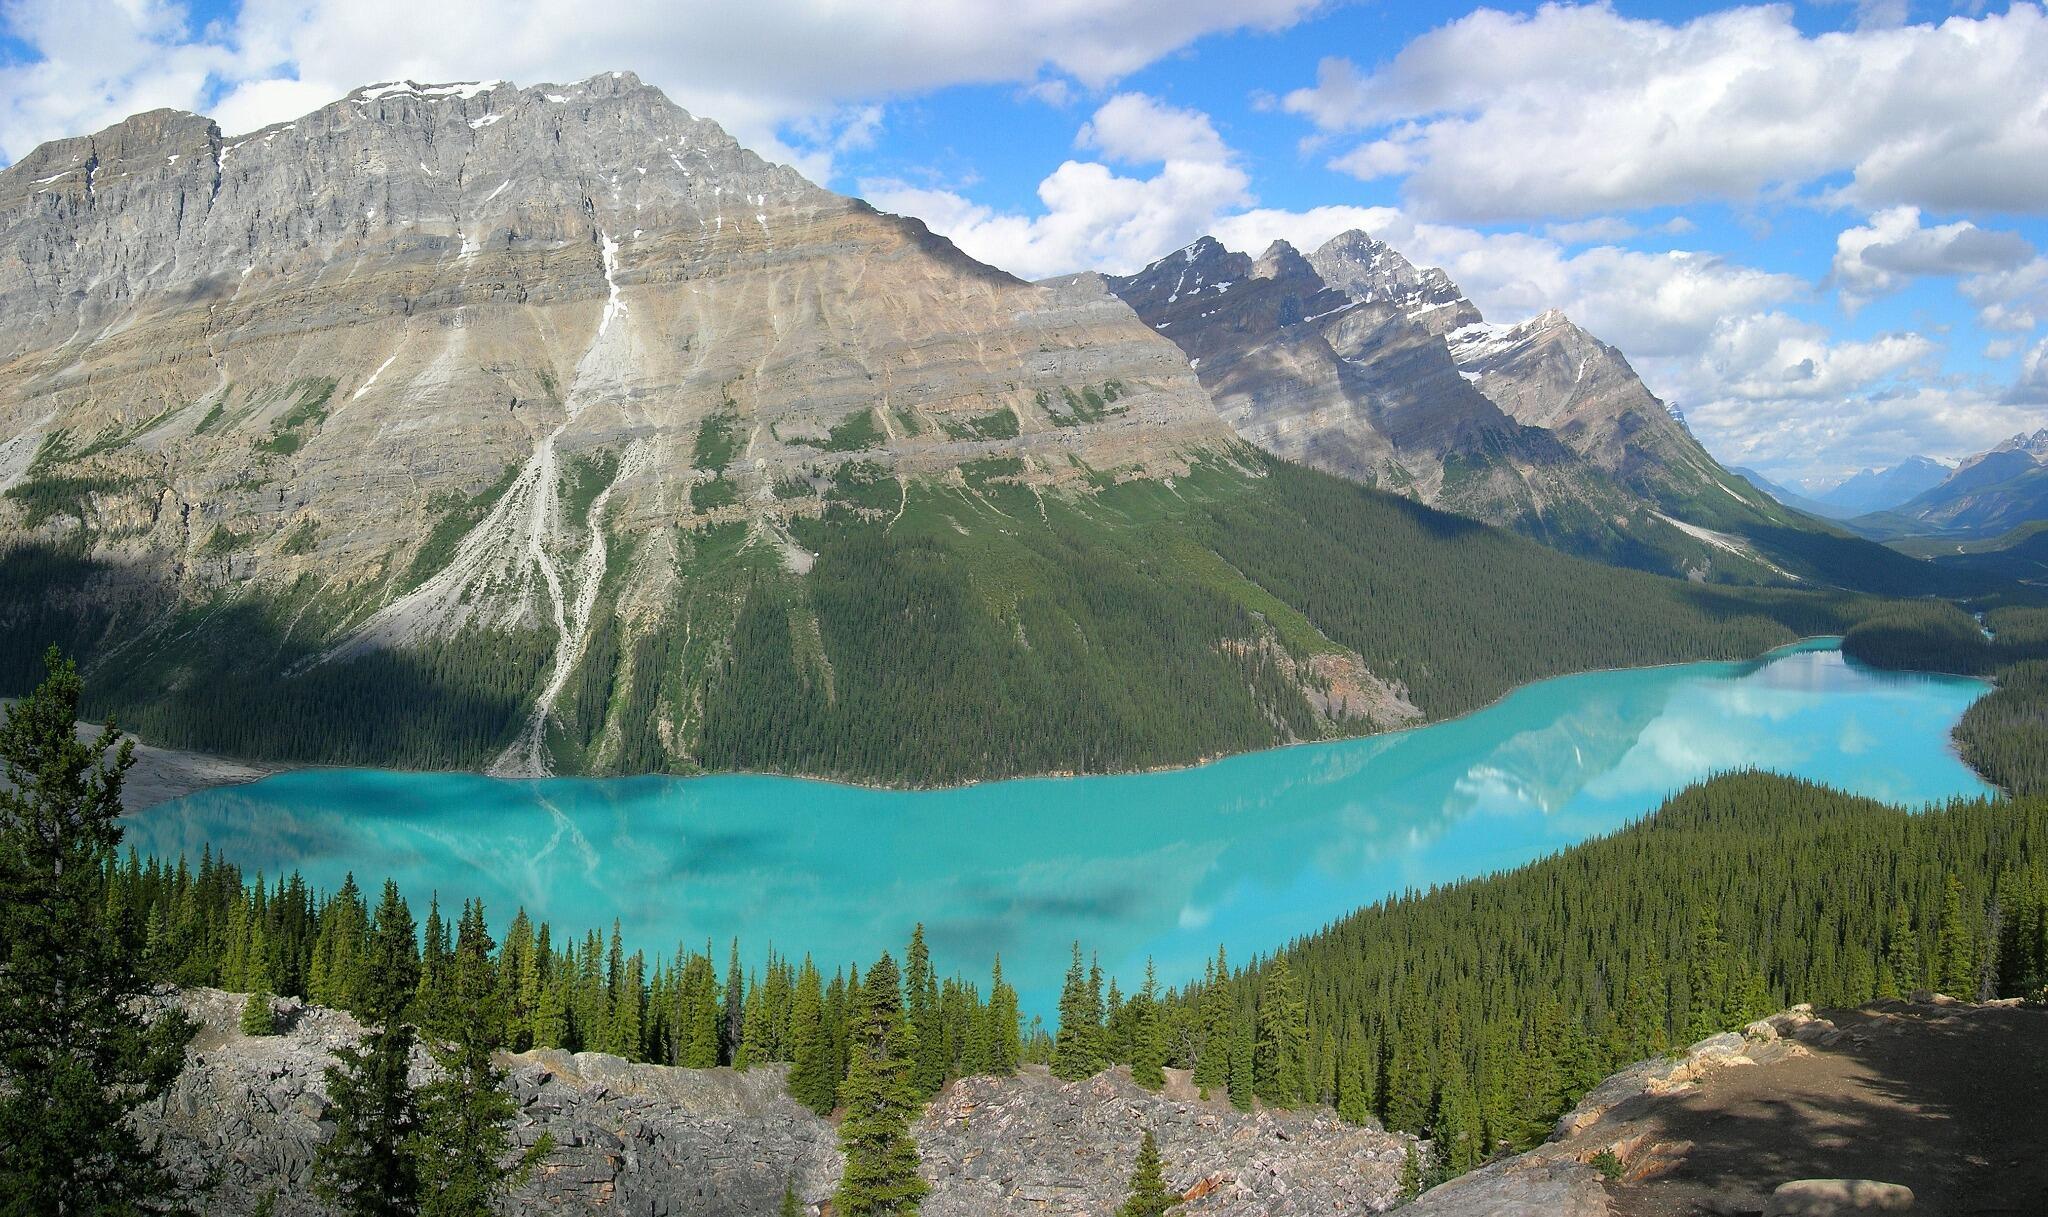 The Glacier-Fed Peyto Lake in Banff National Park, Canada http://t.co/EYg4xgqcMk